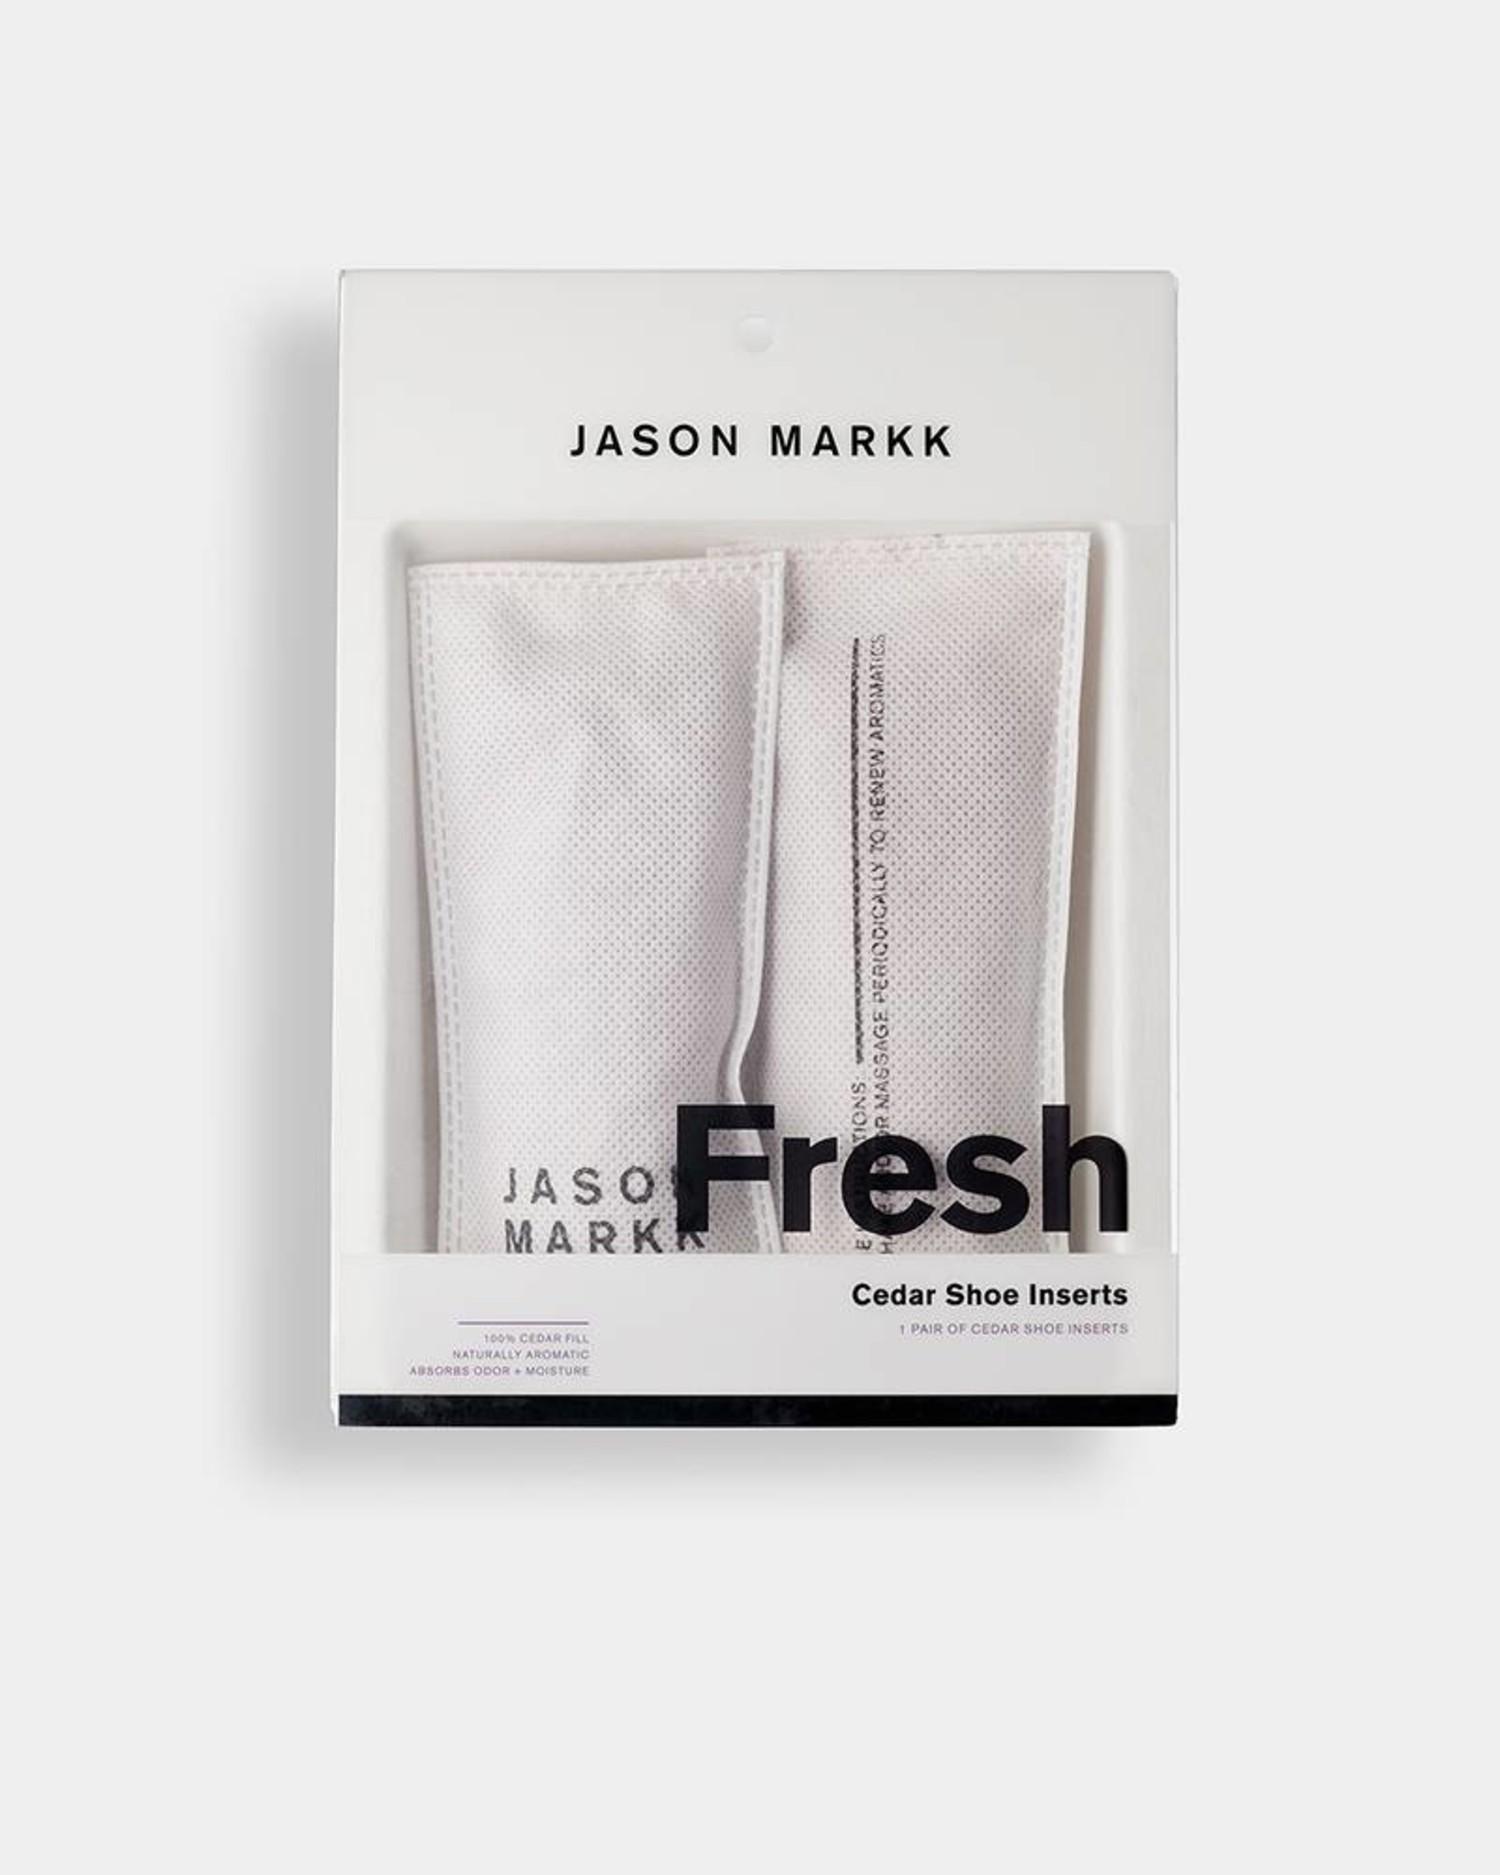 Jason Markk Cedar Wood Scented Inserts